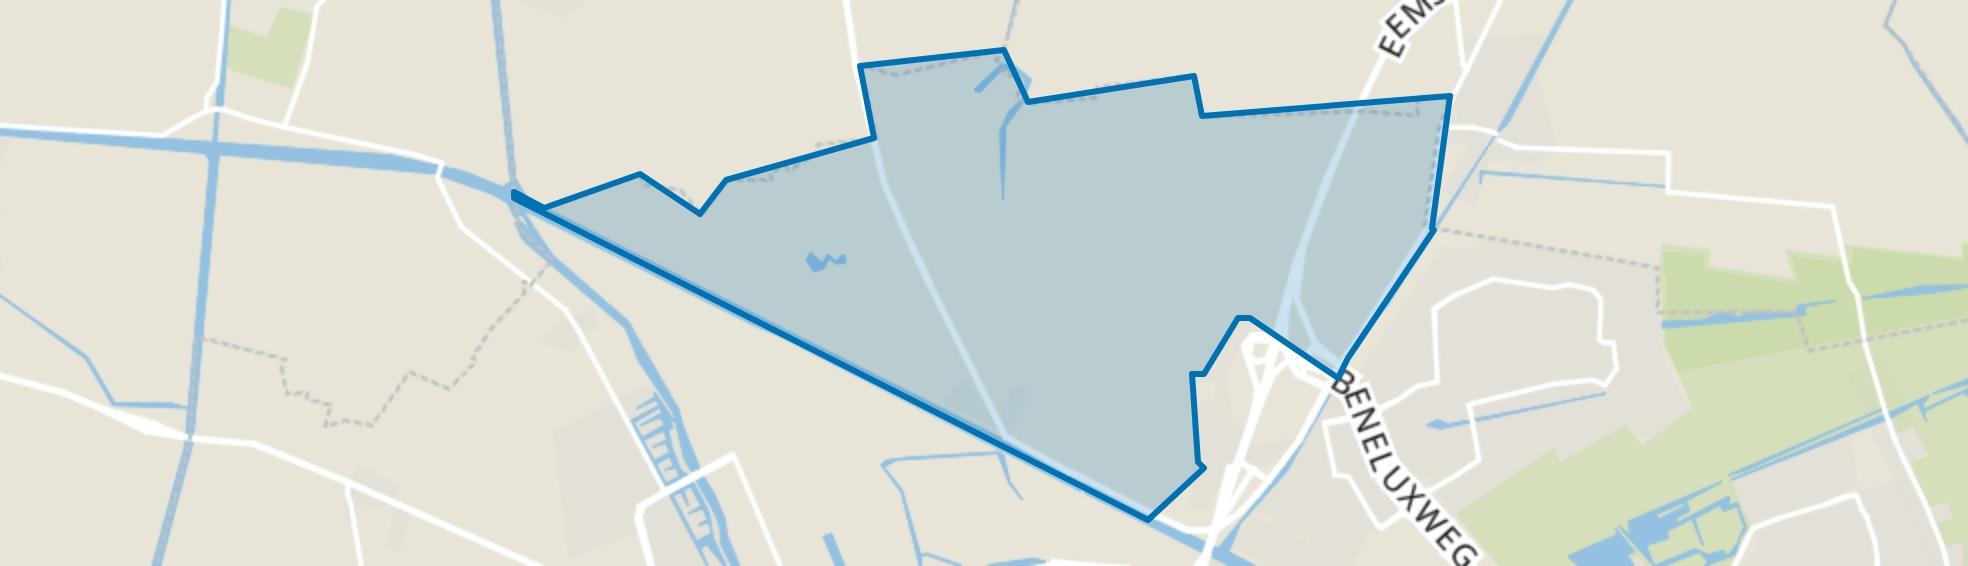 Koningslaagte, Groningen map